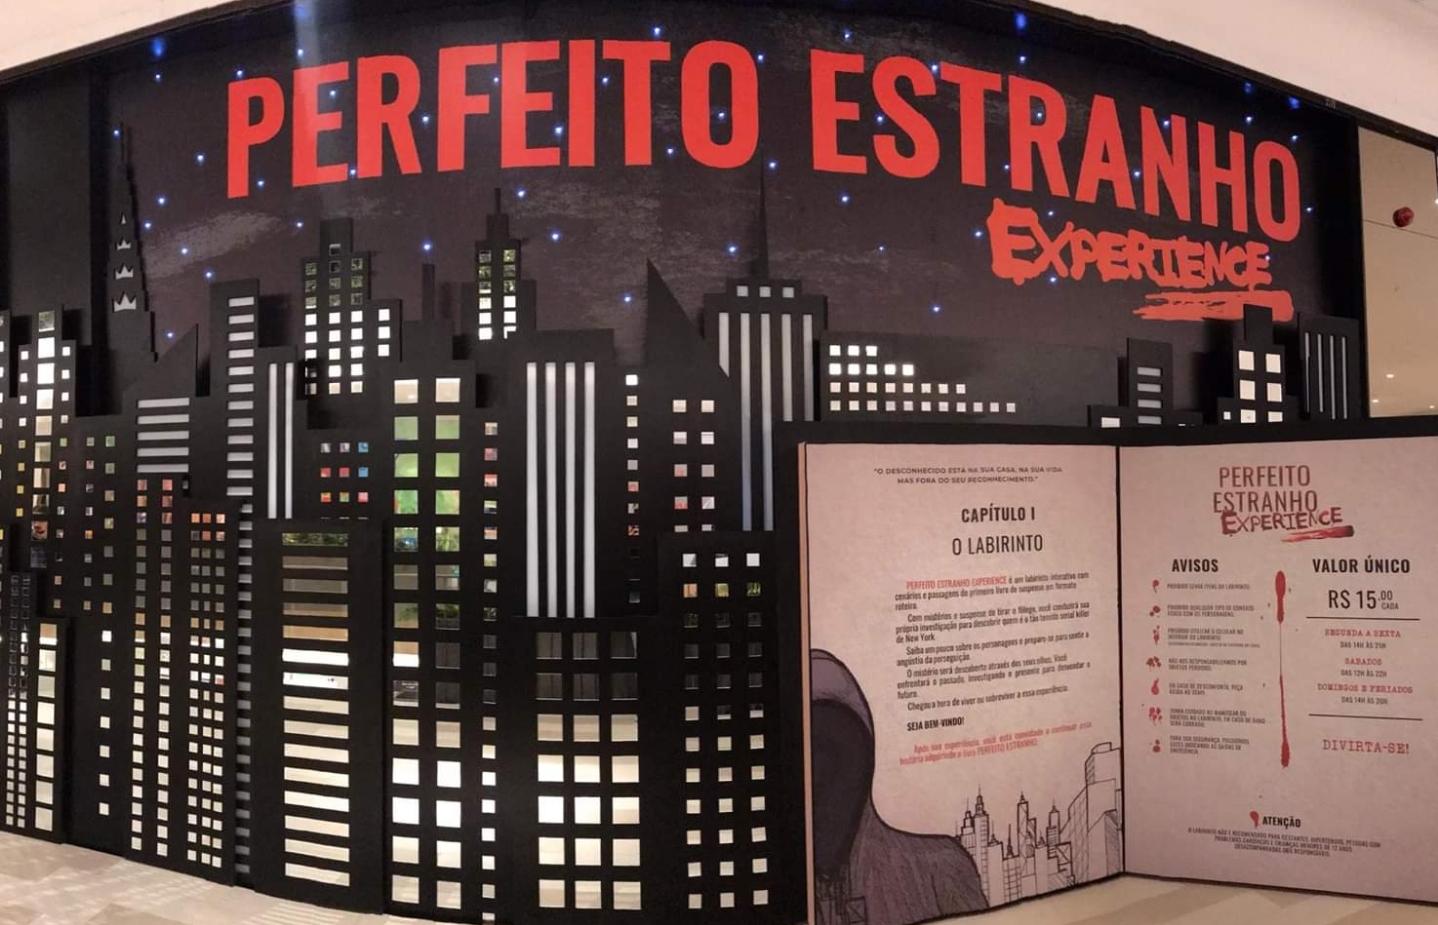 PERFEITO ESTRANHO EXPERIENCE